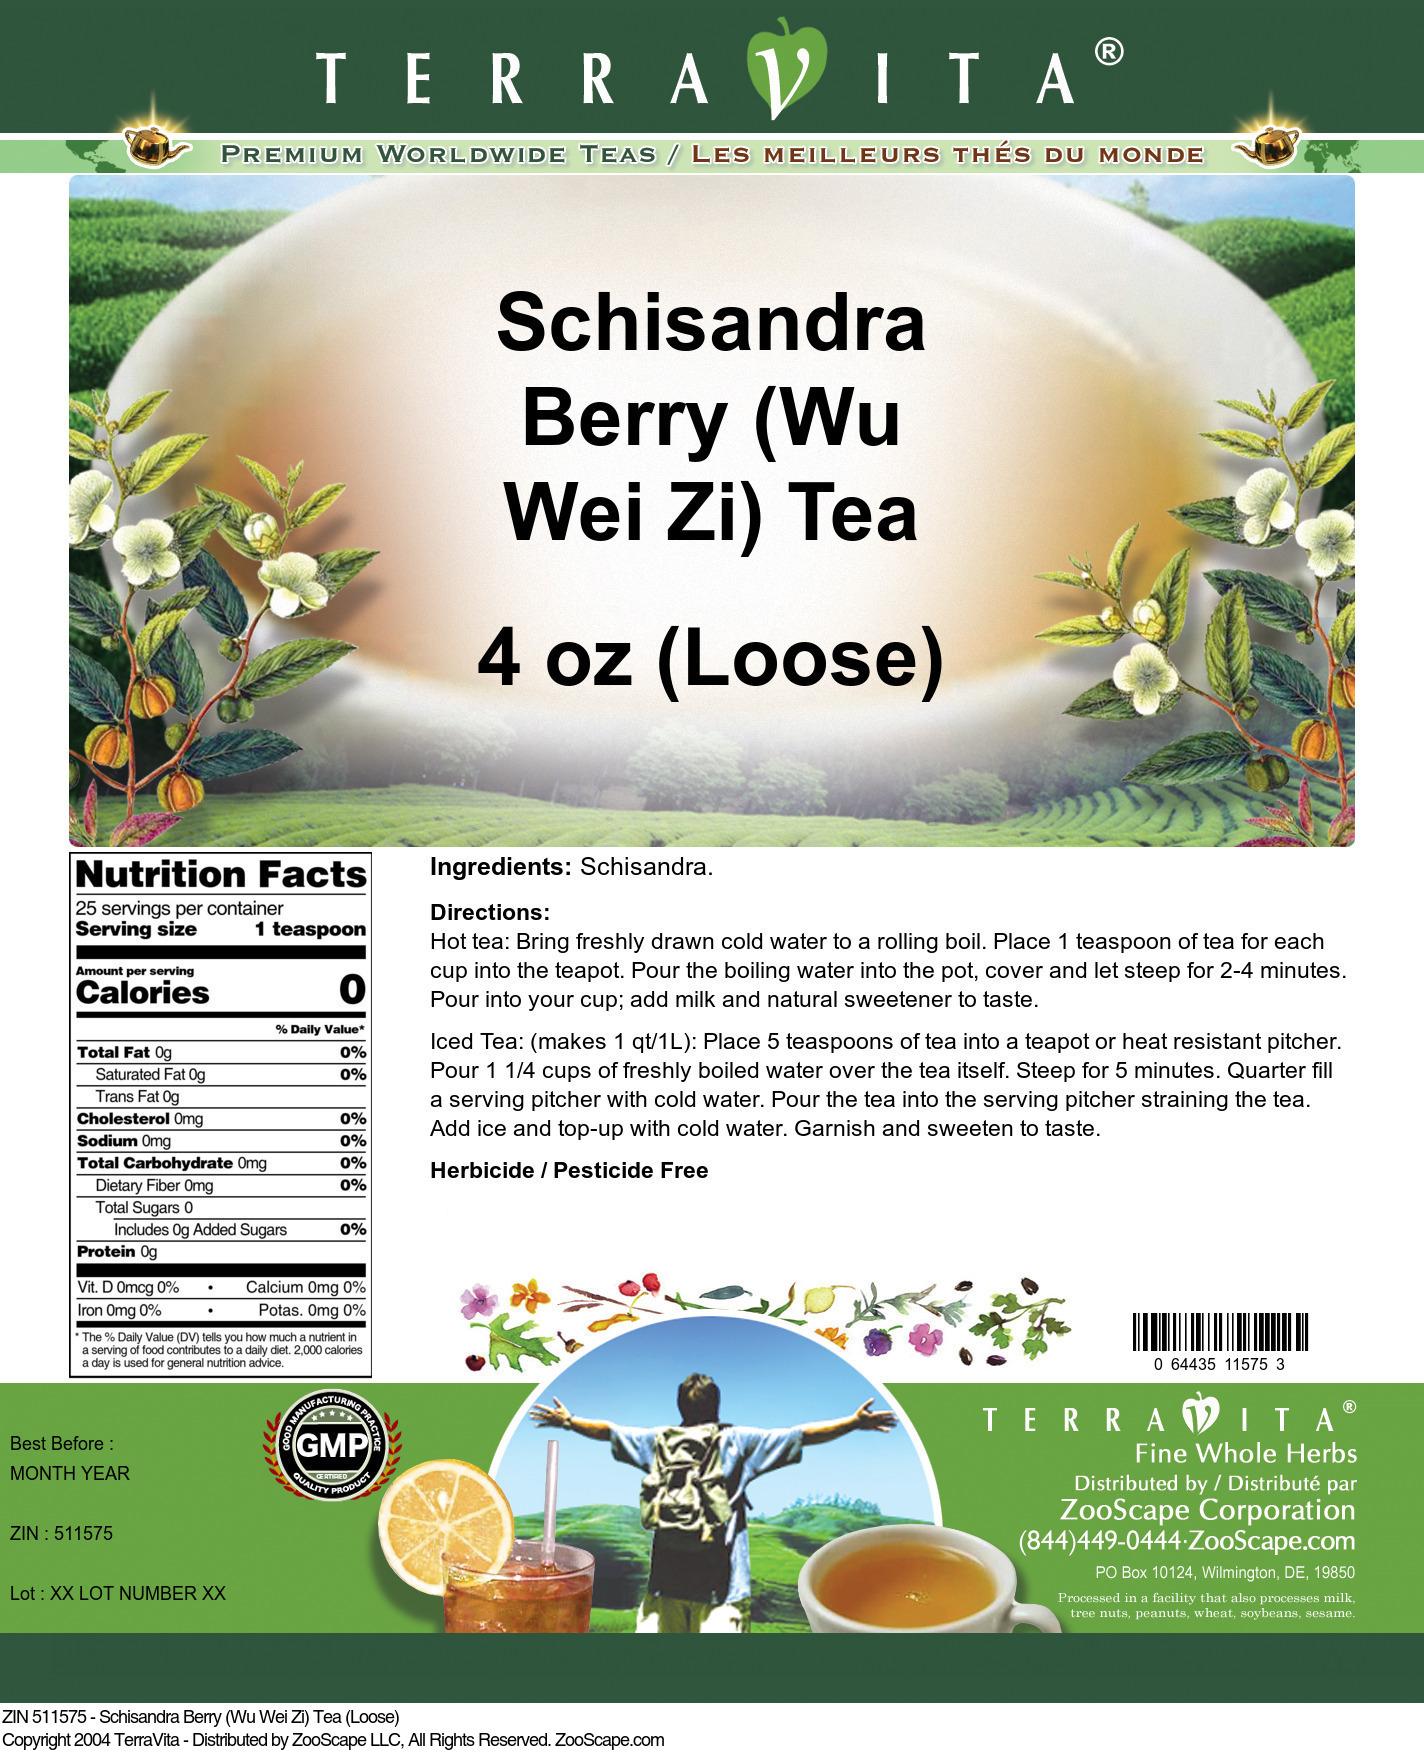 Schisandra Berry (Wu Wei Zi) Tea (Loose) - Label